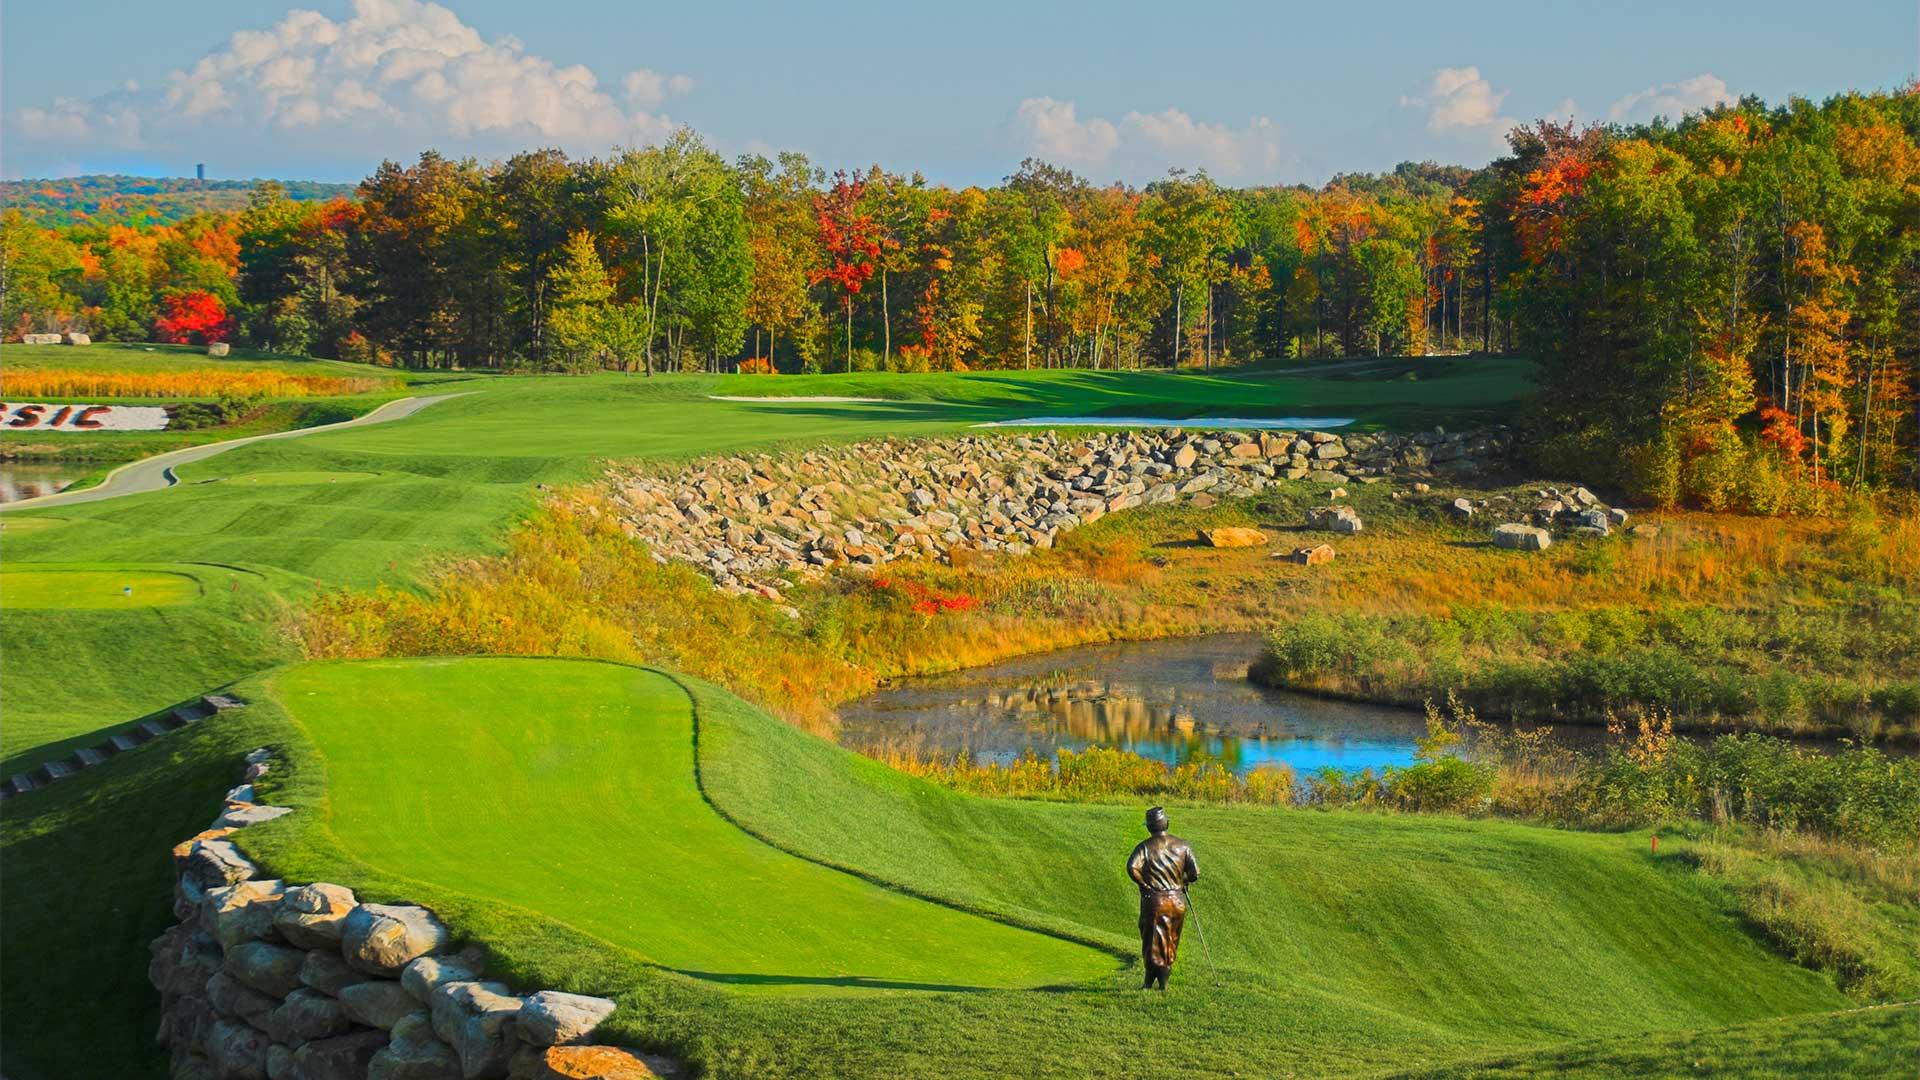 golf course during autumn